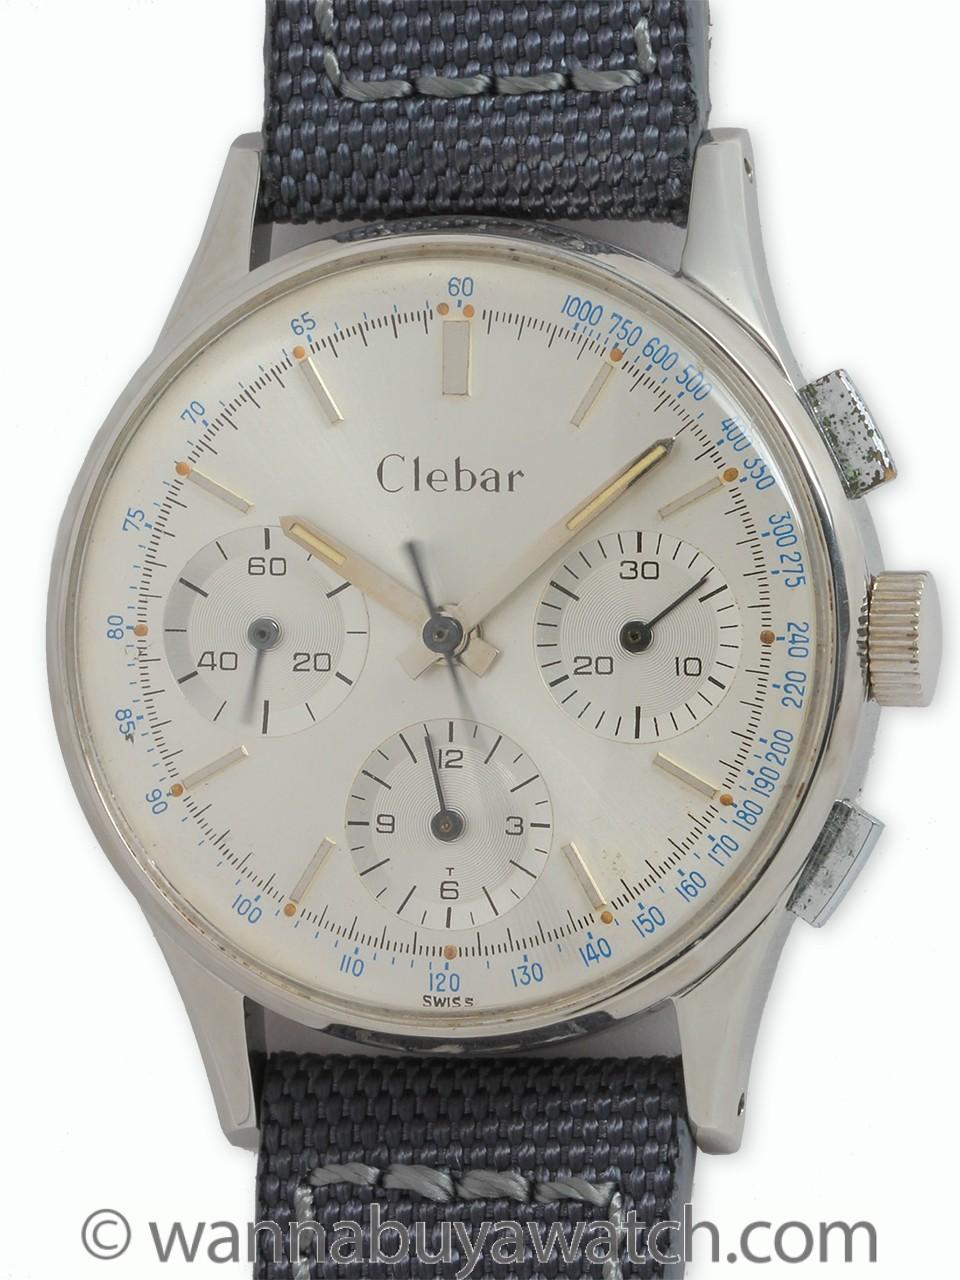 Clebar SS Chronograph circa 1950's